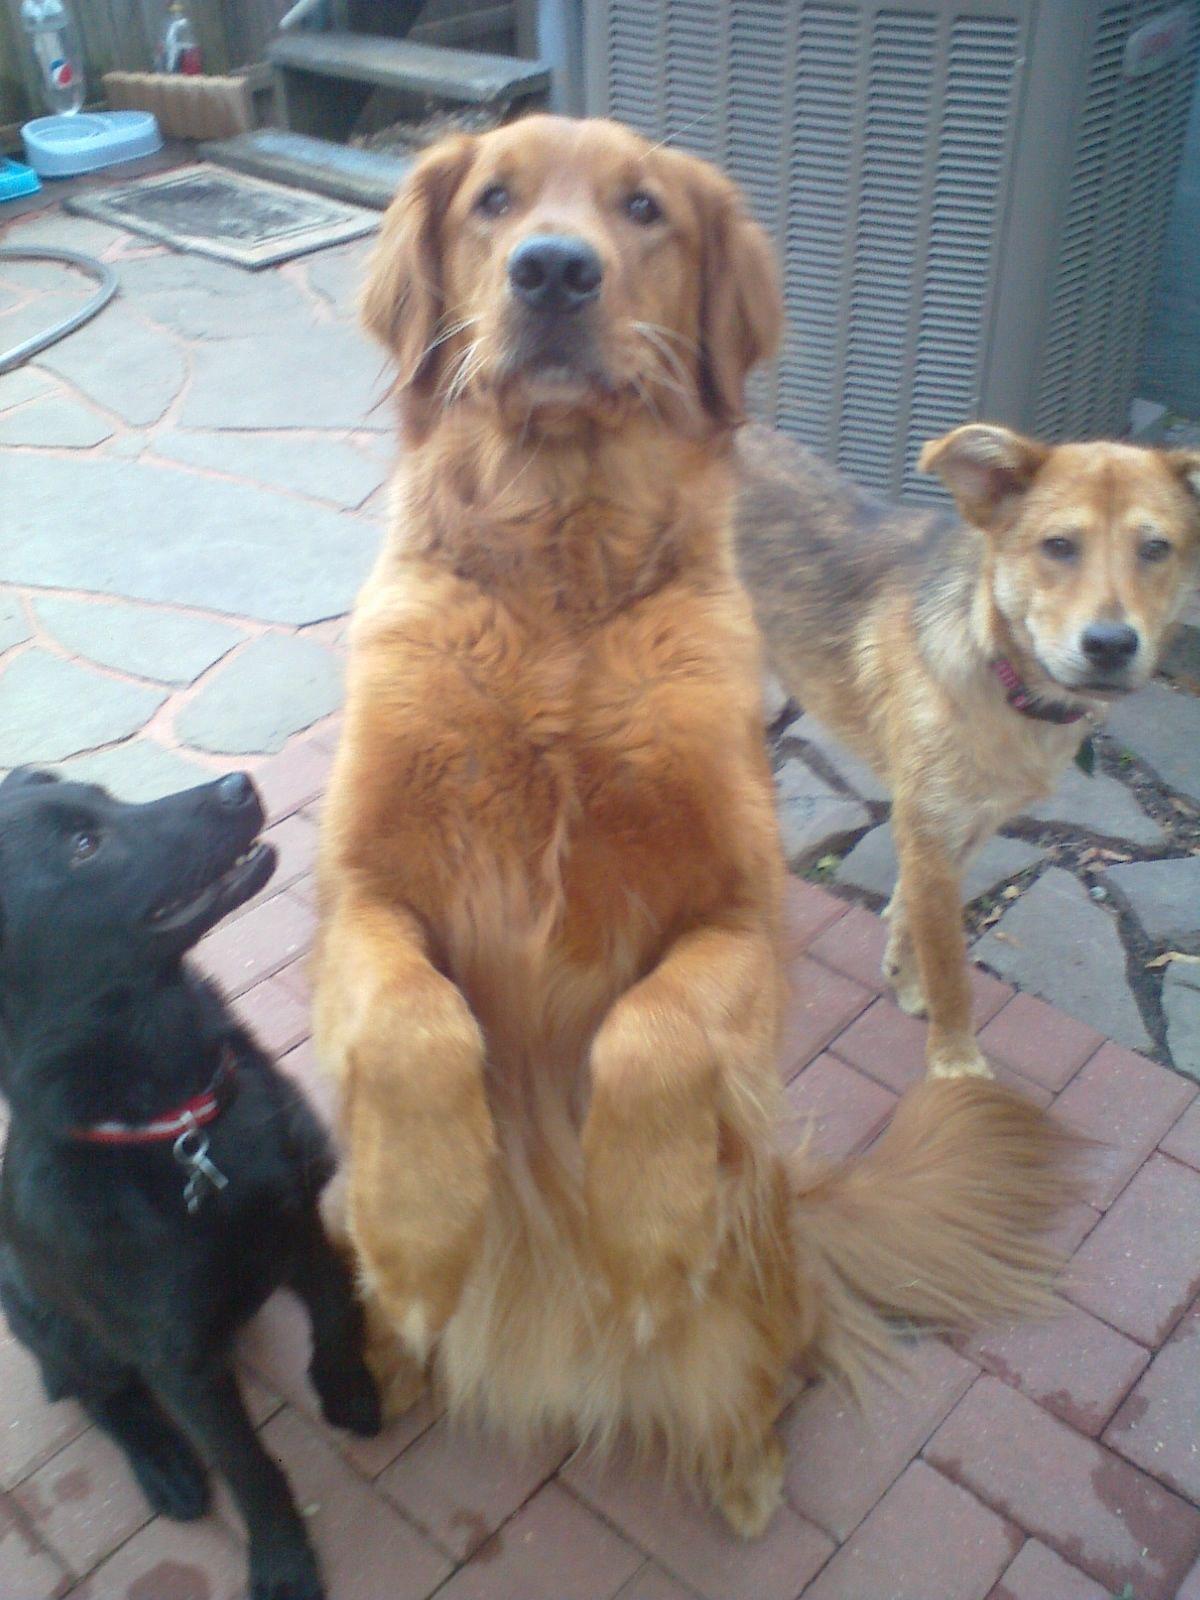 All dogs deserve wonderful homes!